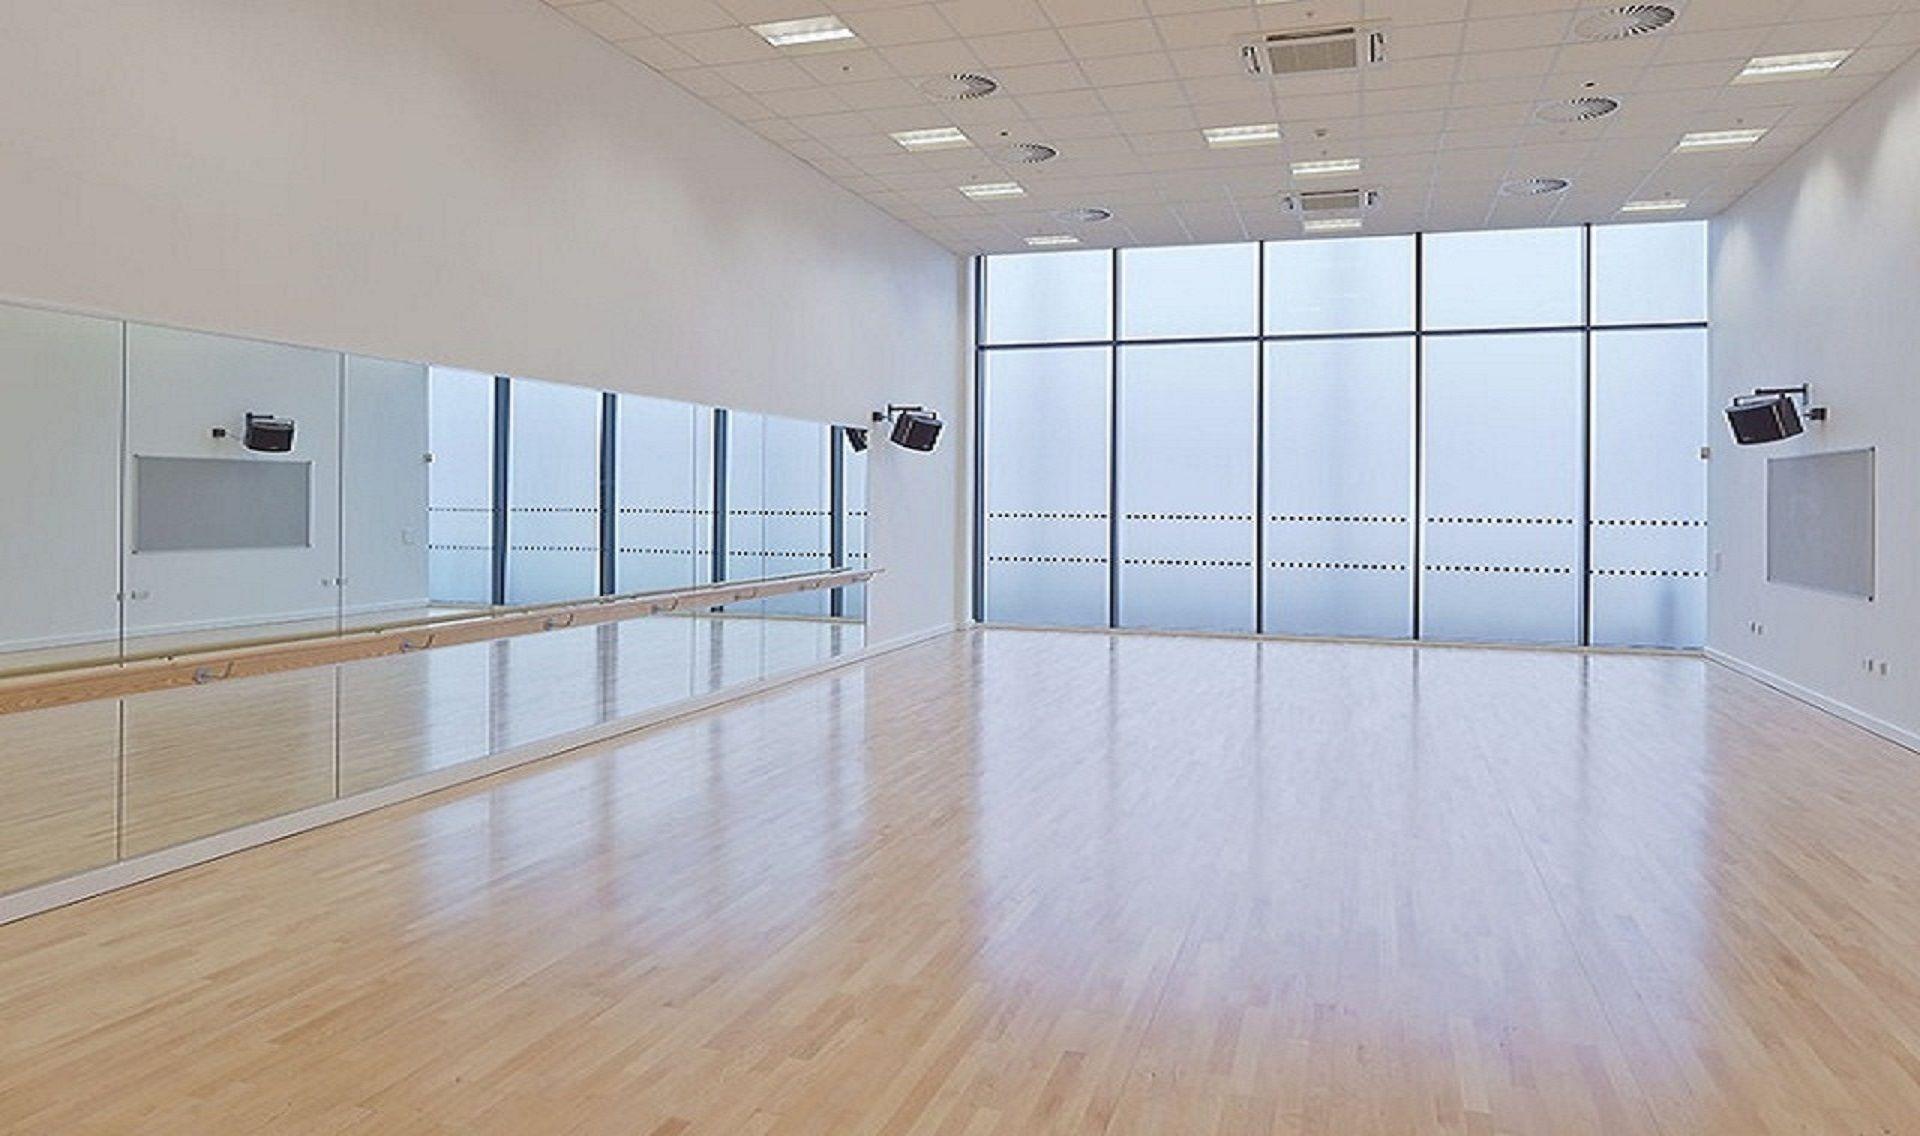 Int dance studio large episodeinteractive episode